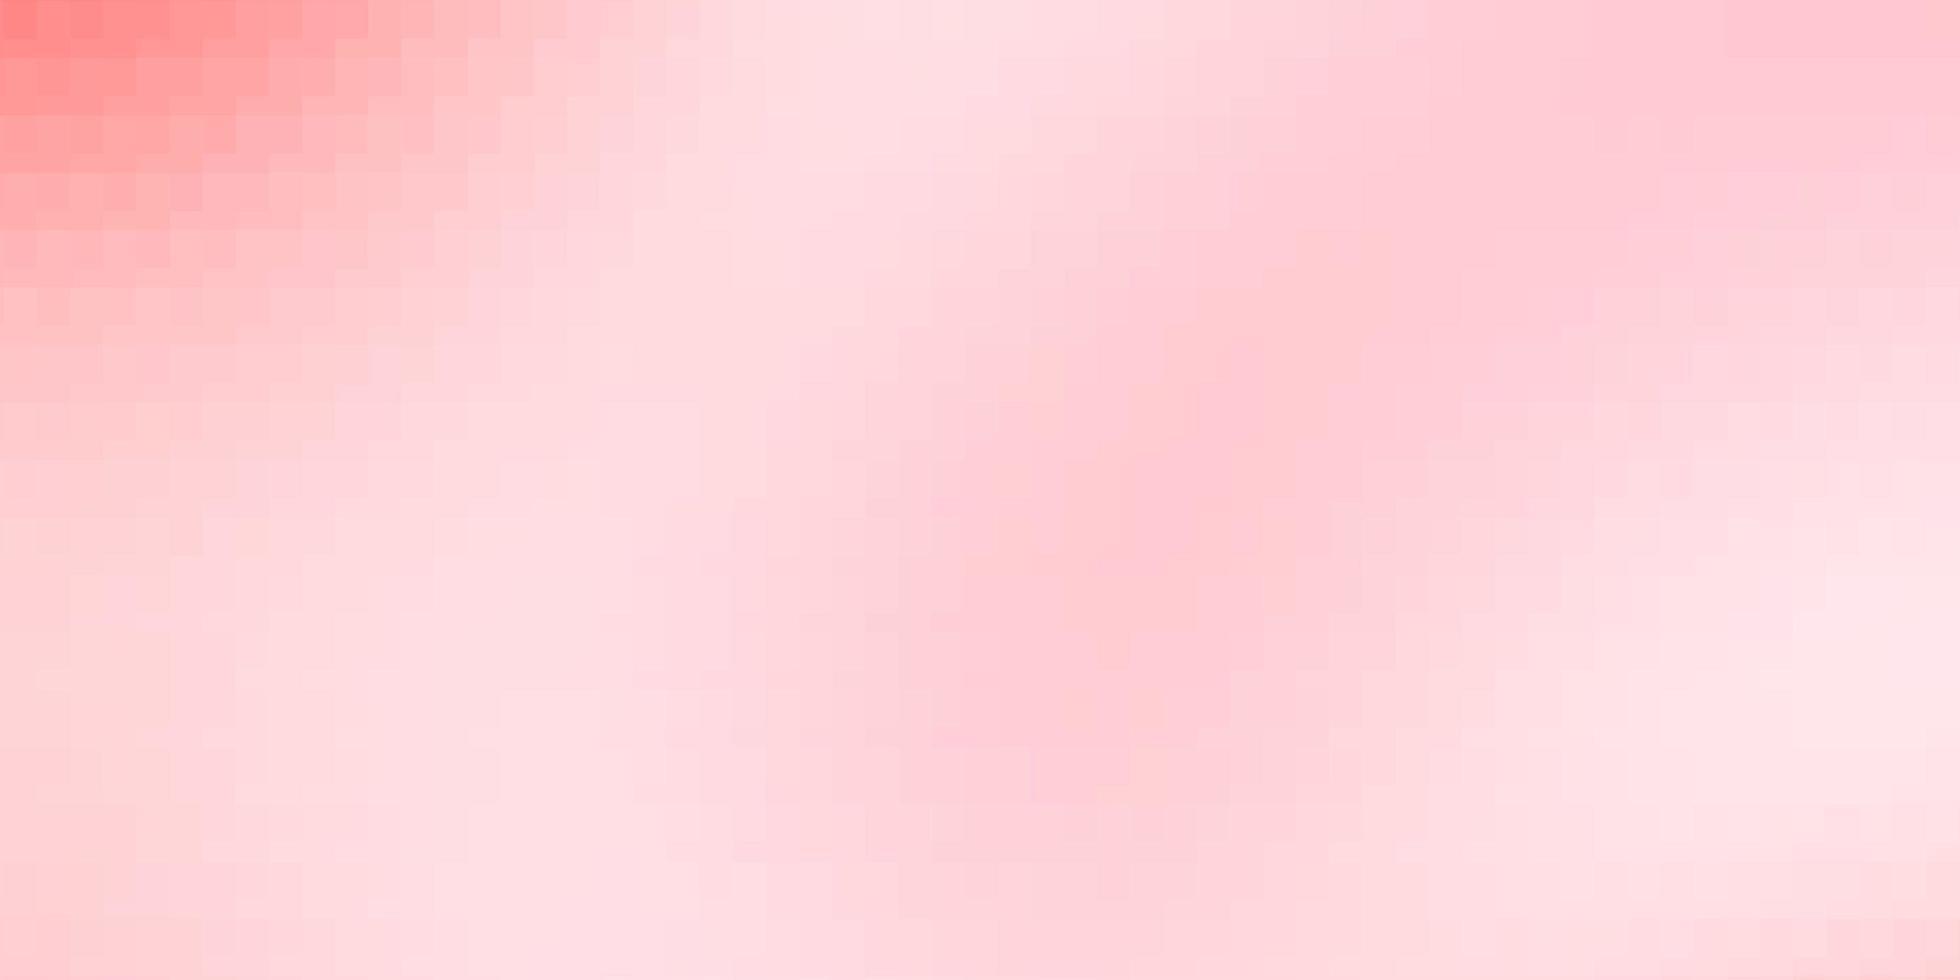 Fondo de vector rojo claro en estilo poligonal.